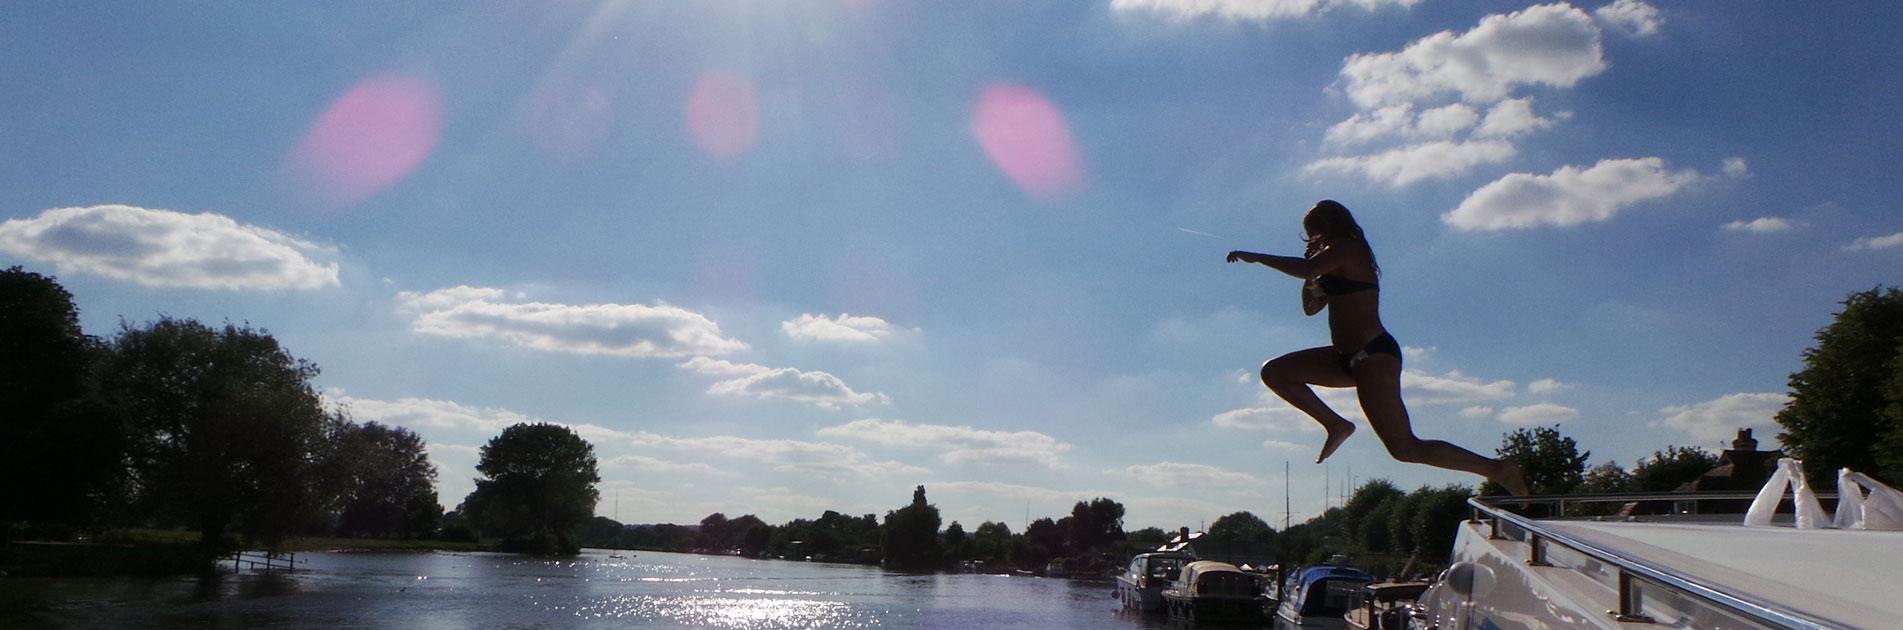 Svømmer hopper i vandet i Bristol-området